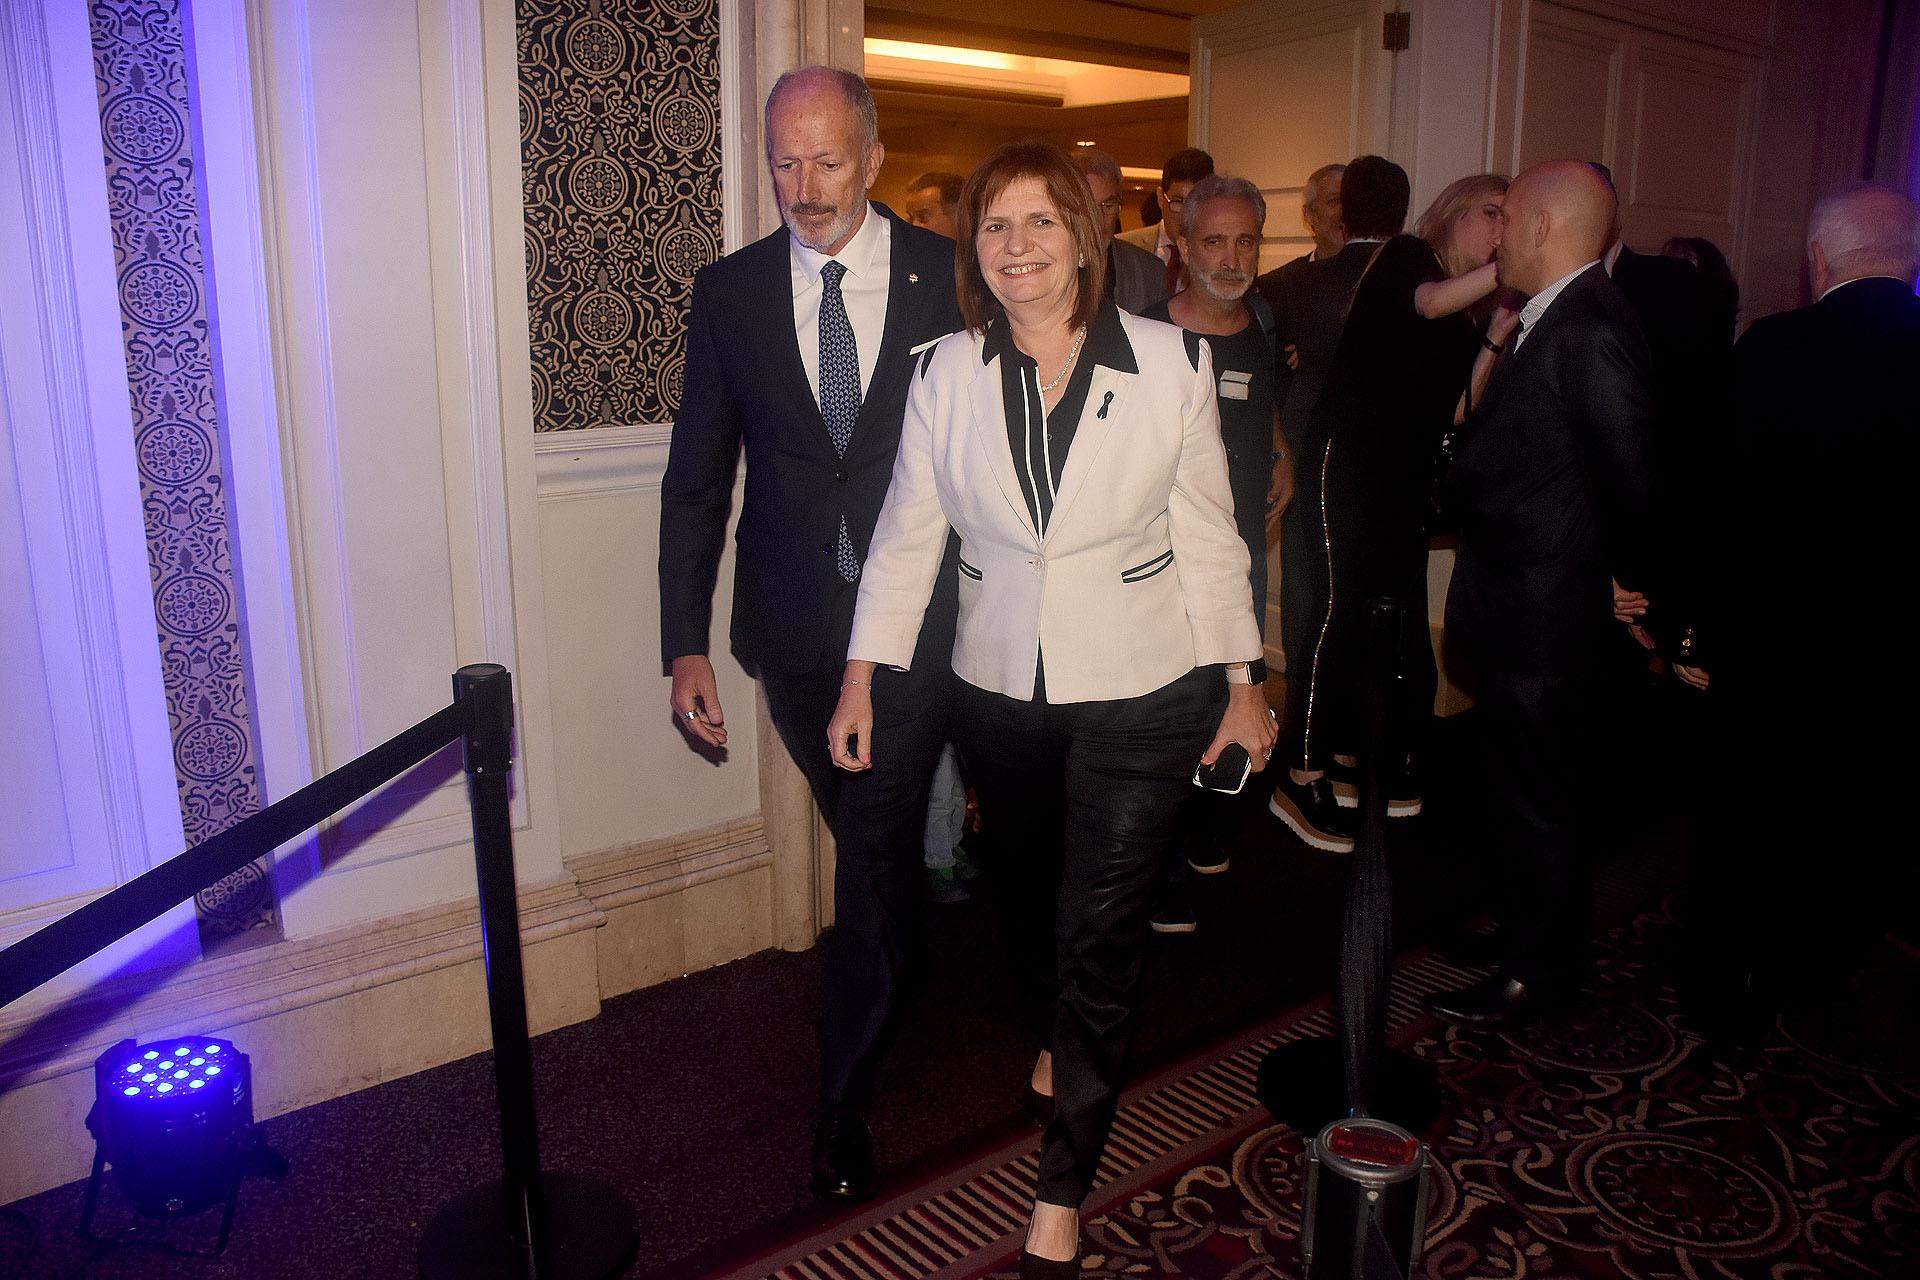 La ministra de Seguridad, Patricia Bullrich, camina junto a Jorge Knoblovits